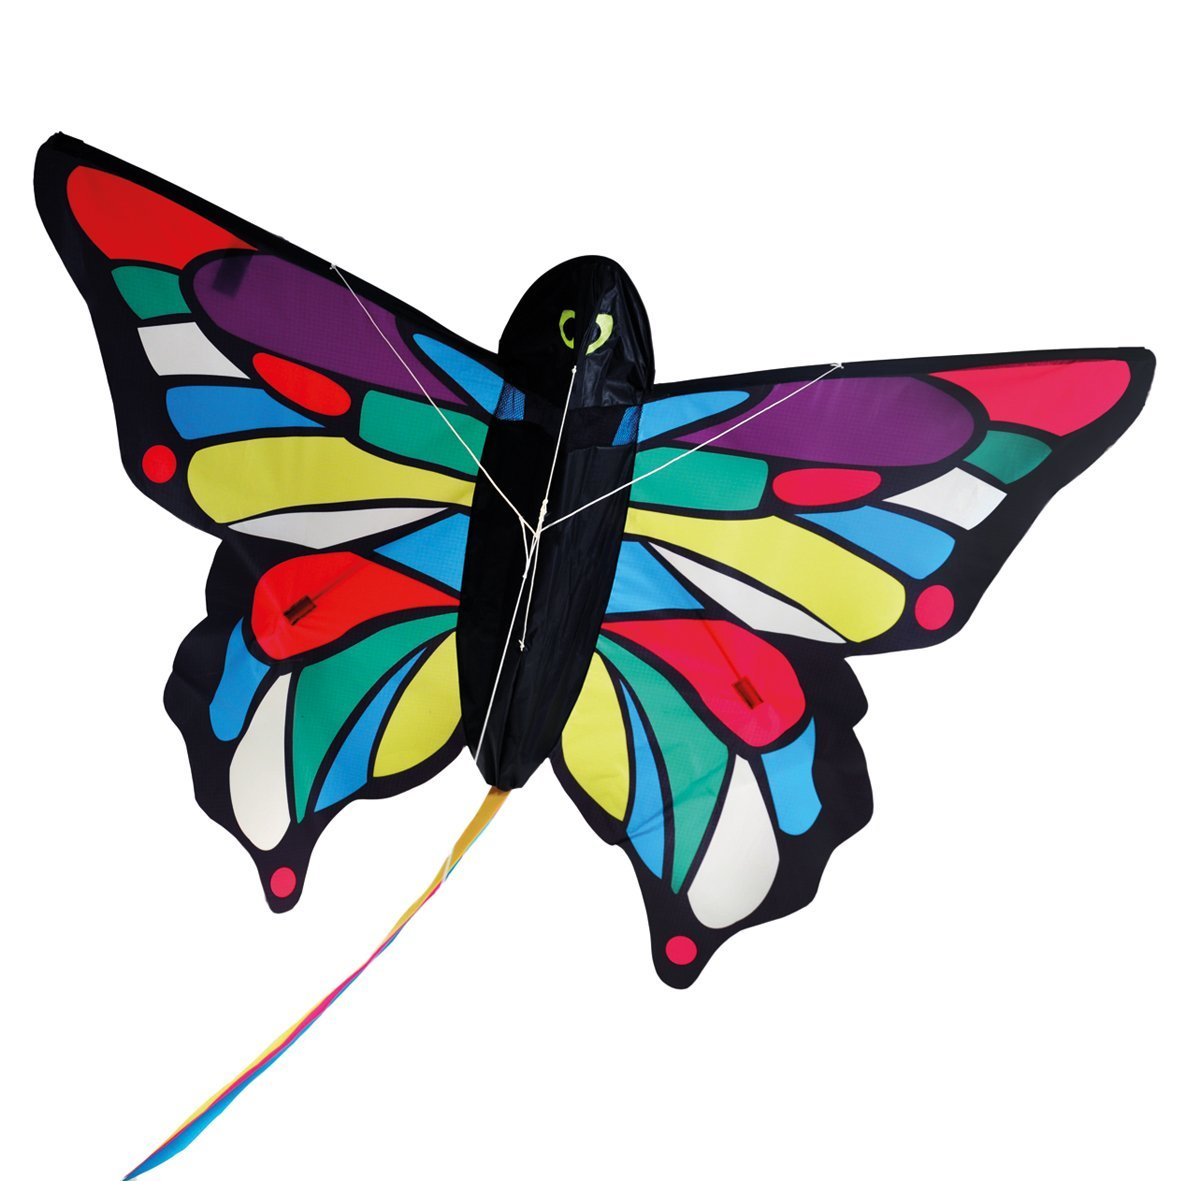 kite runner pdf free online